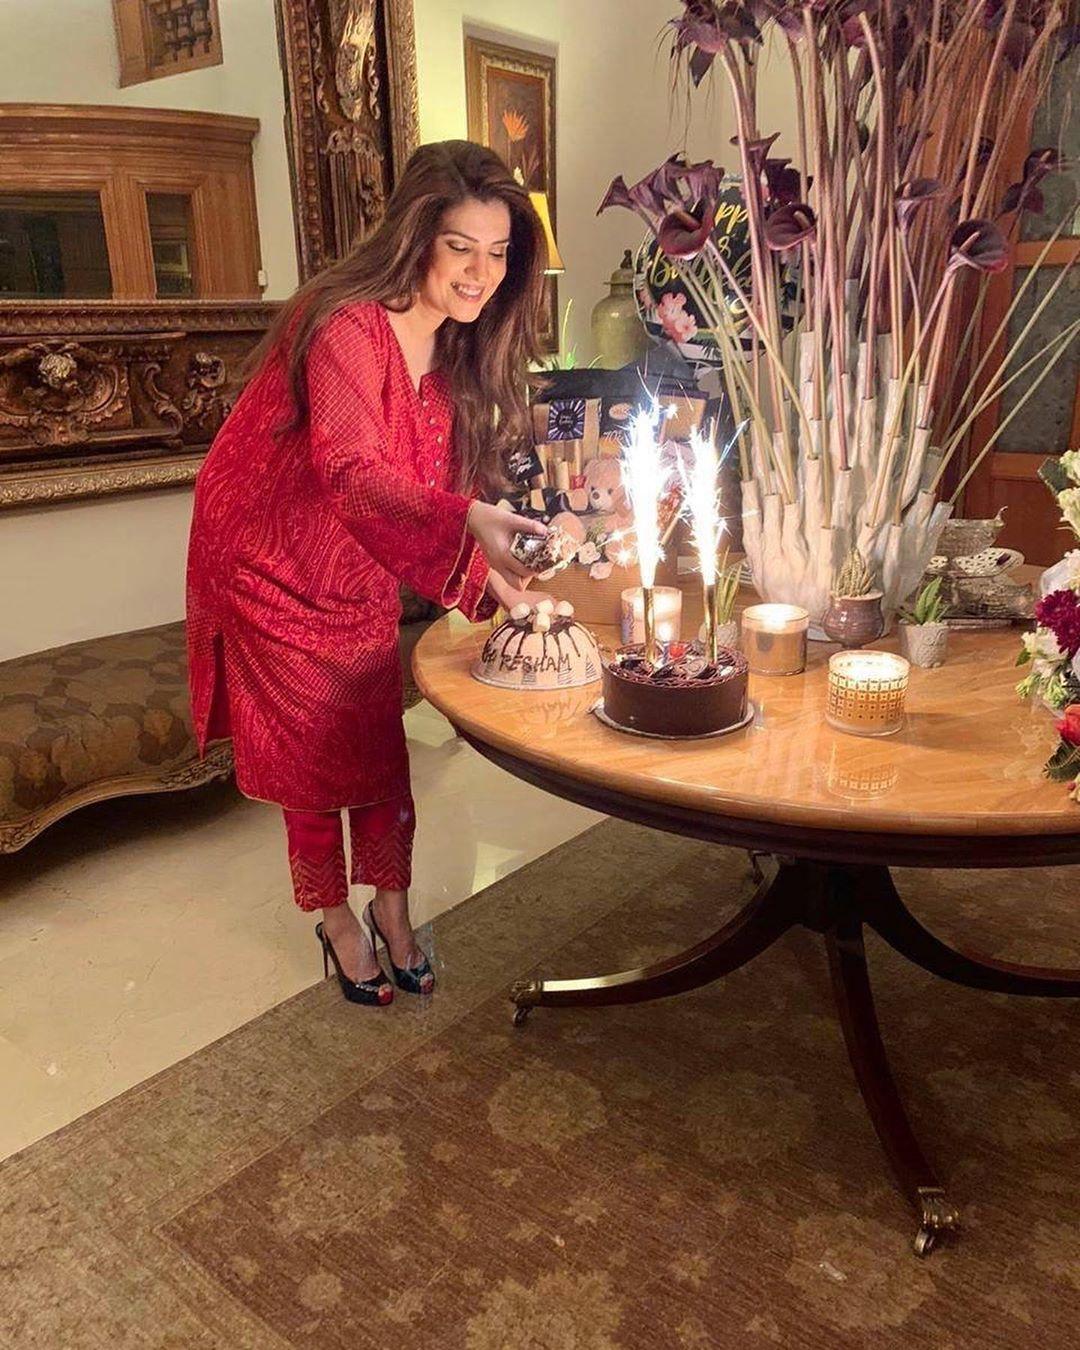 Resham Pakistani Actress Celebrate Birthday Party with Friends (11)